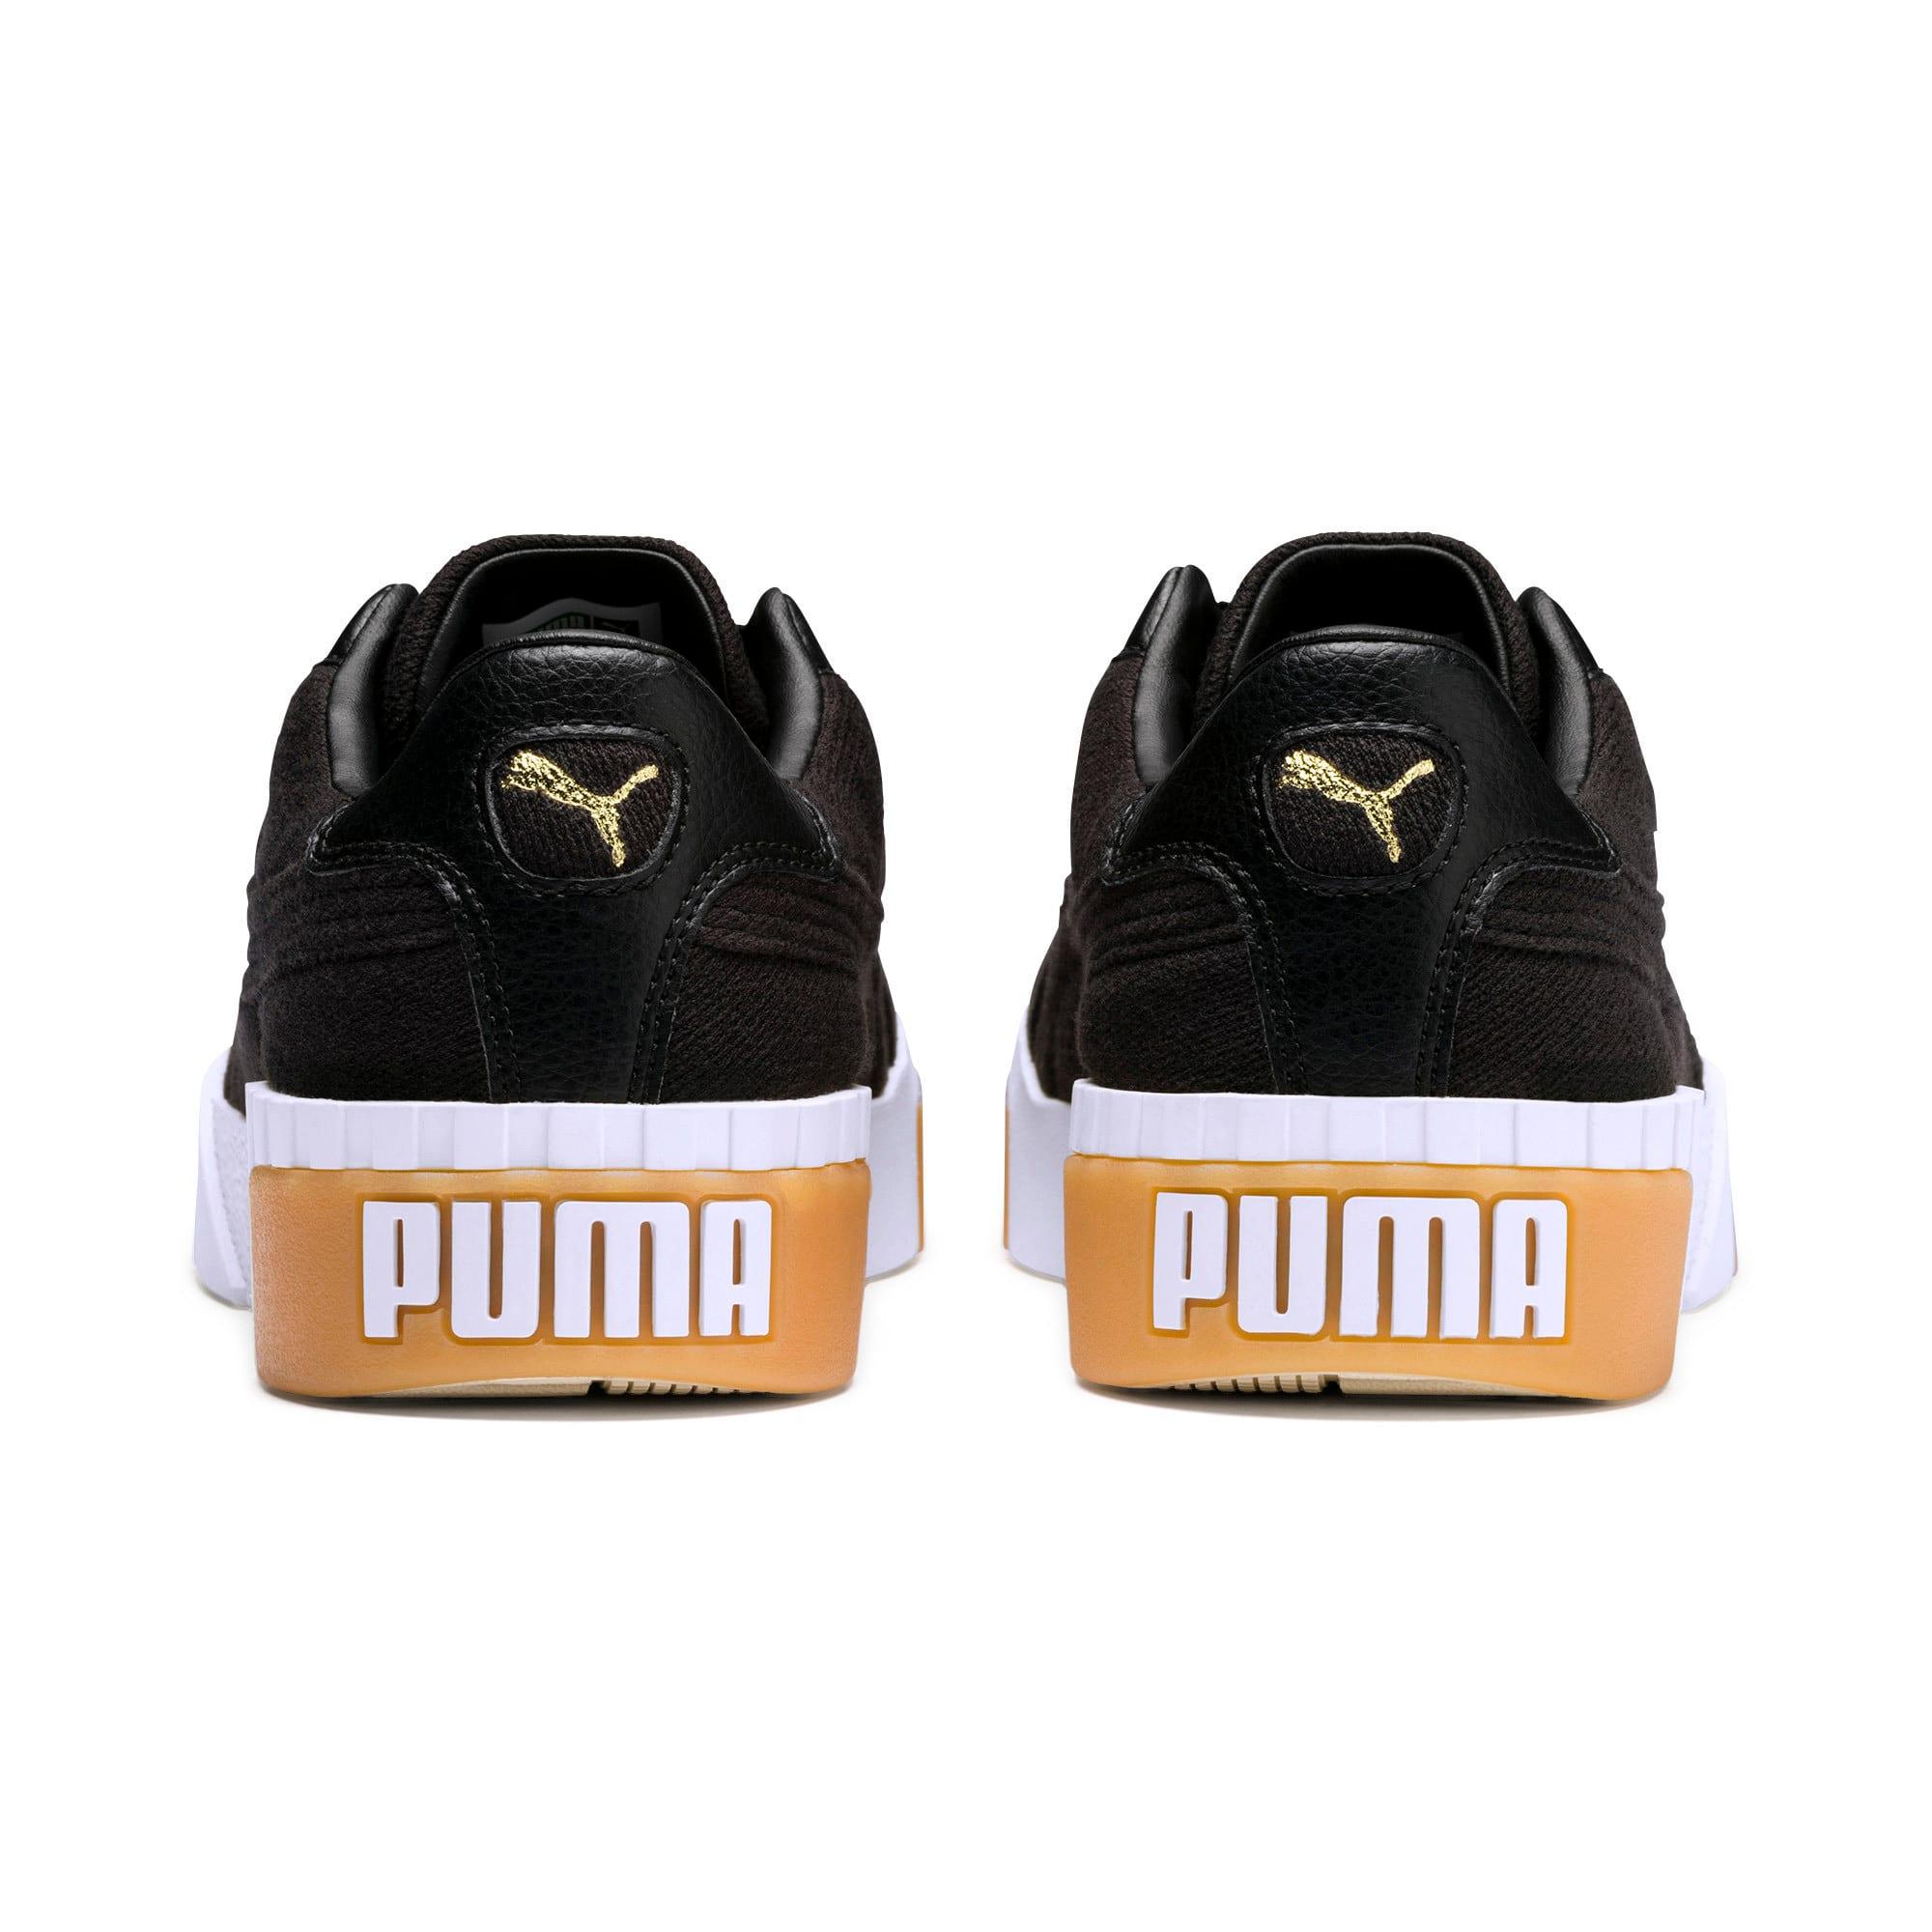 Thumbnail 3 of Cali Exotic Damen Sneaker, Puma Black-Puma Black, medium